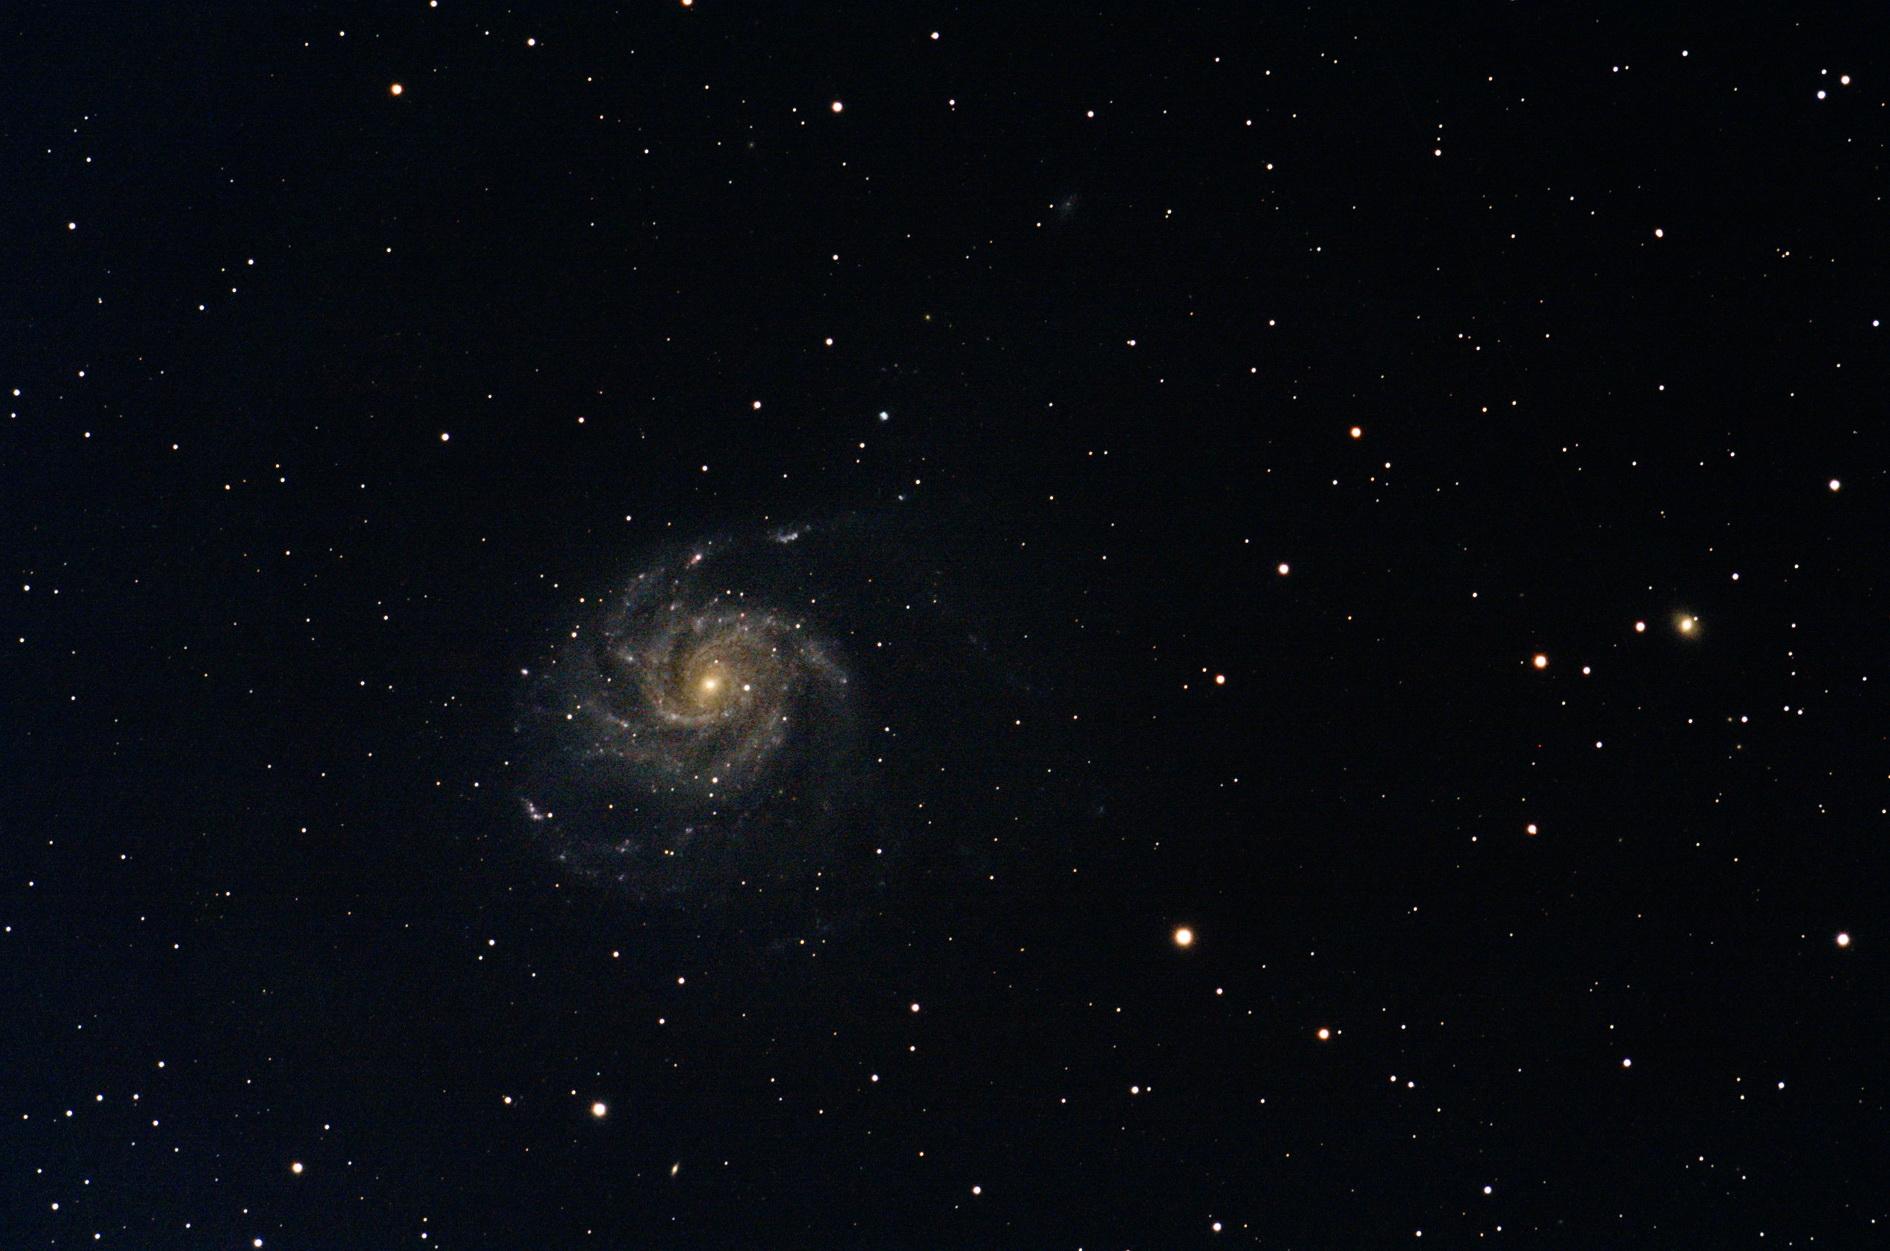 M101_A.BERNARD_EOS40D_Equinox120ED